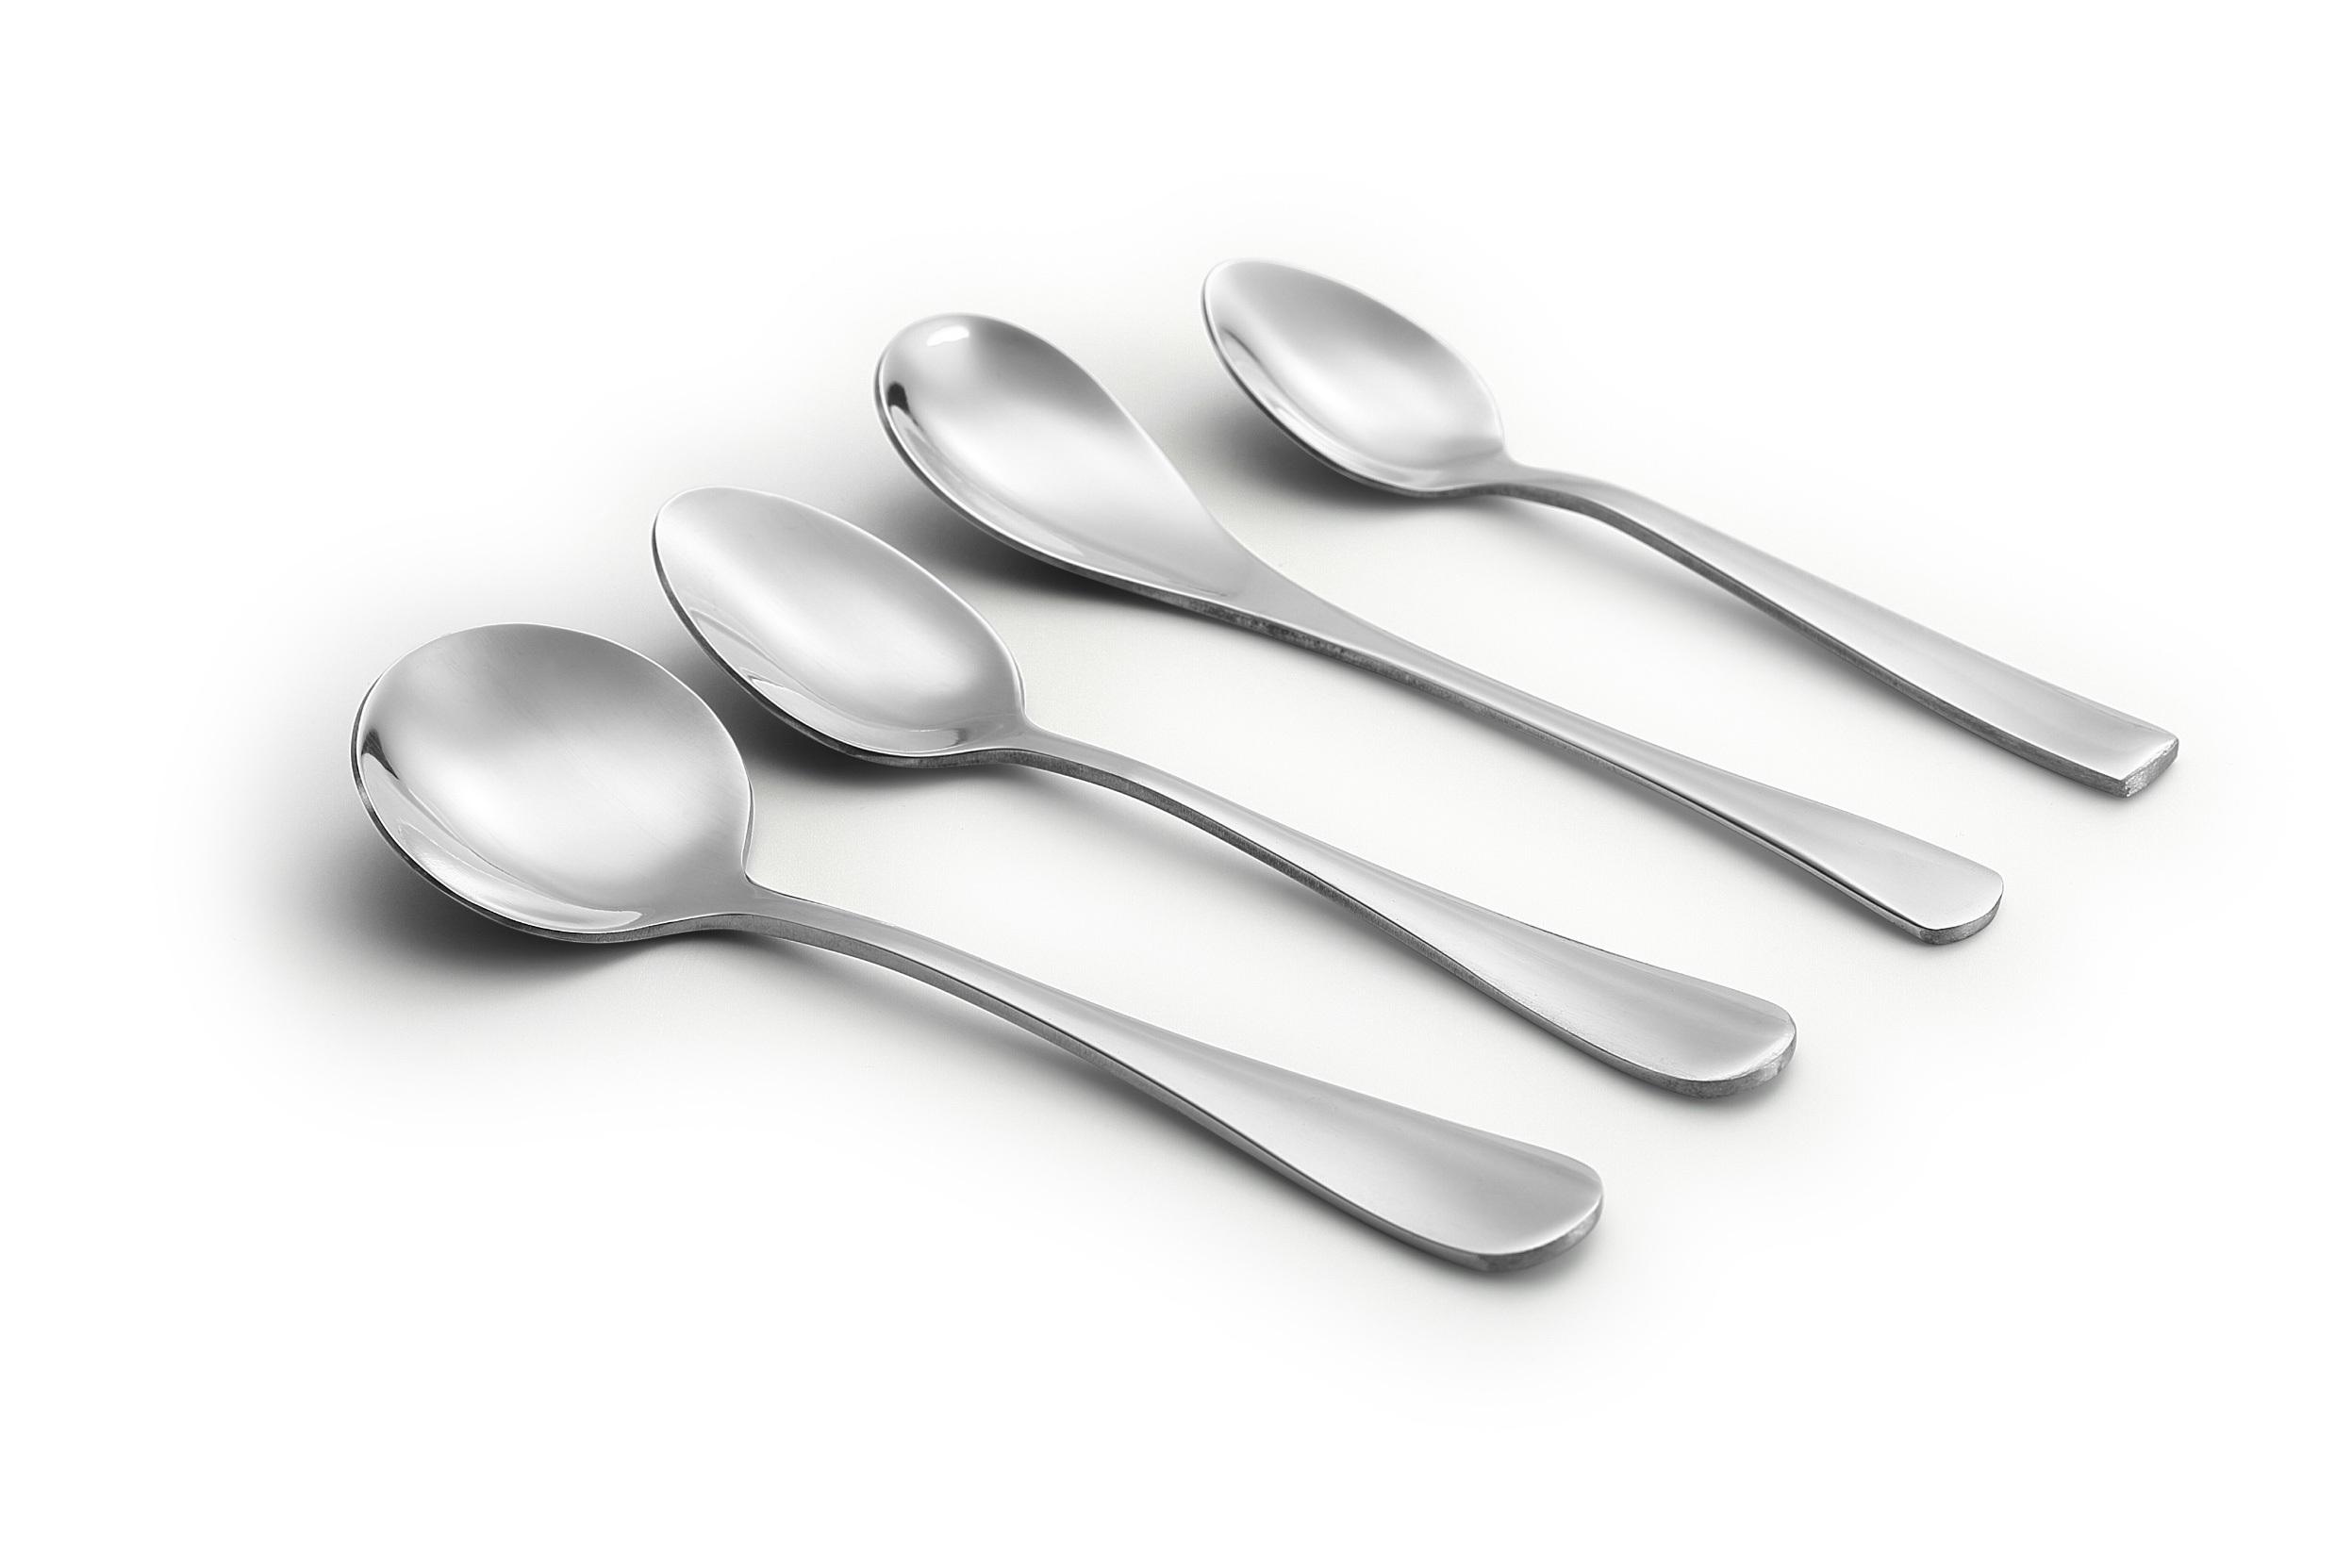 Kitchen Accessories Food Ware Coffee Spoon